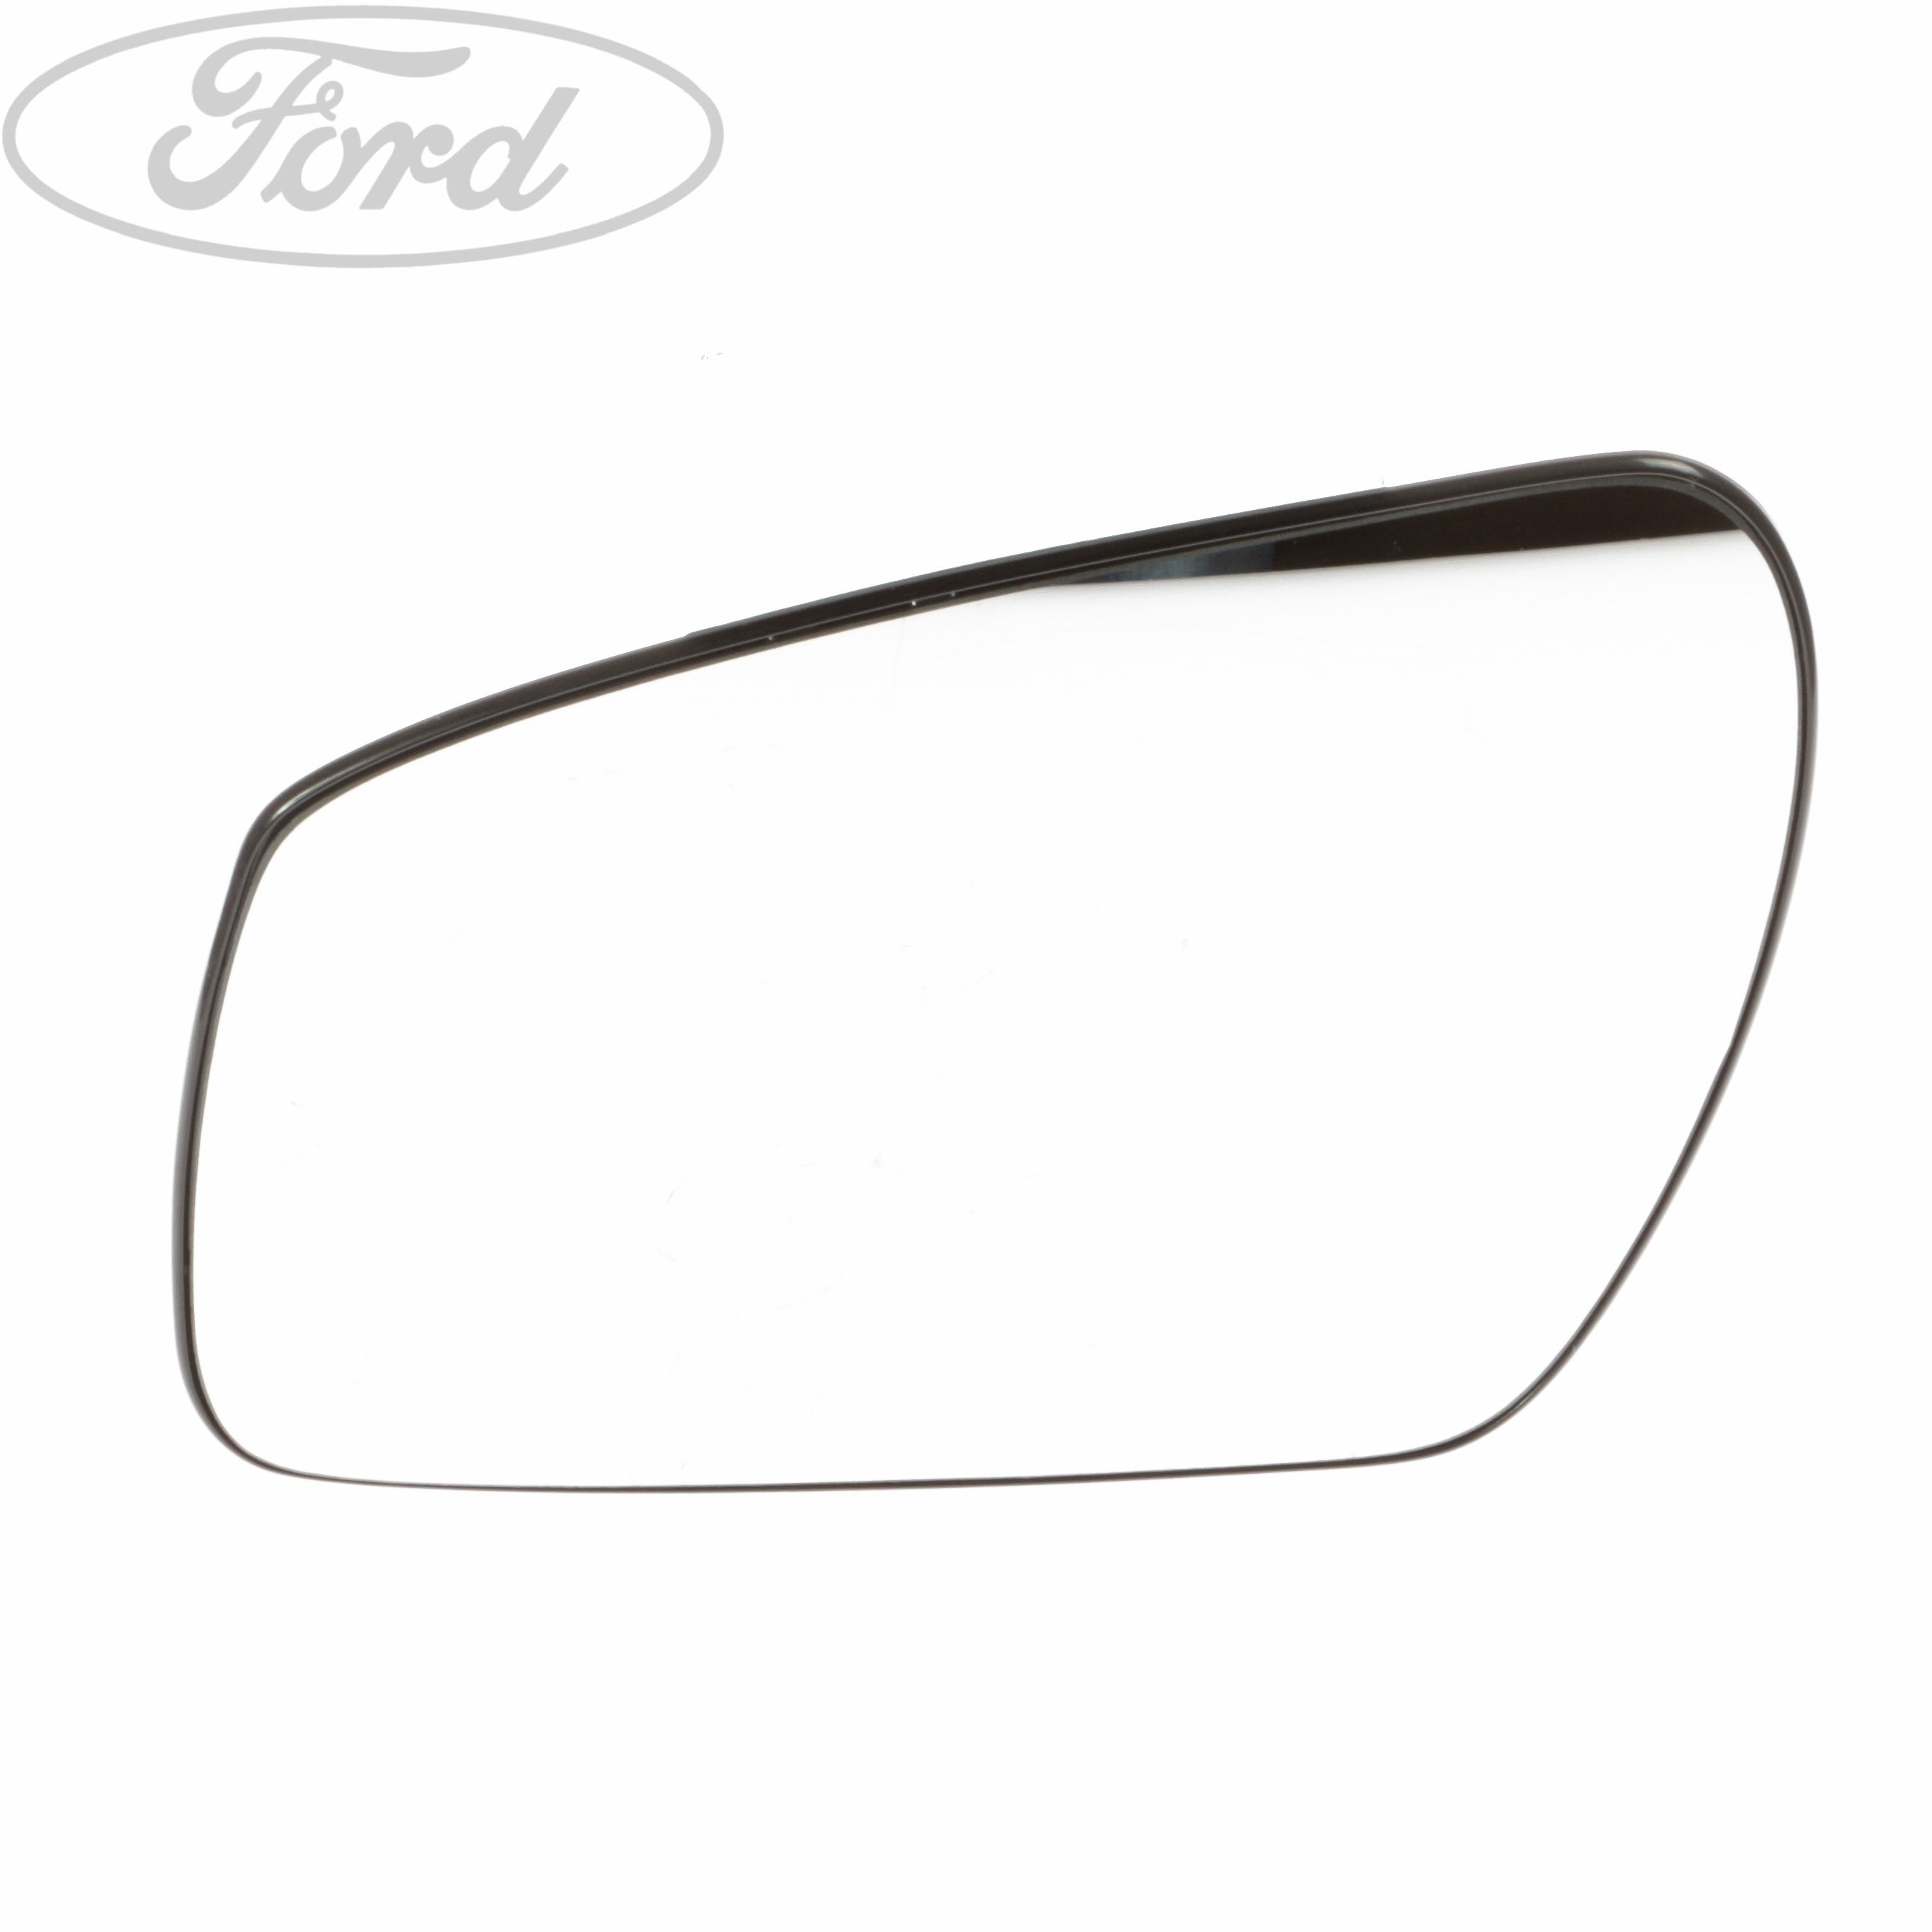 Genuine Ford Fiesta MK6 Fusion N/S Wing Mirror Glass